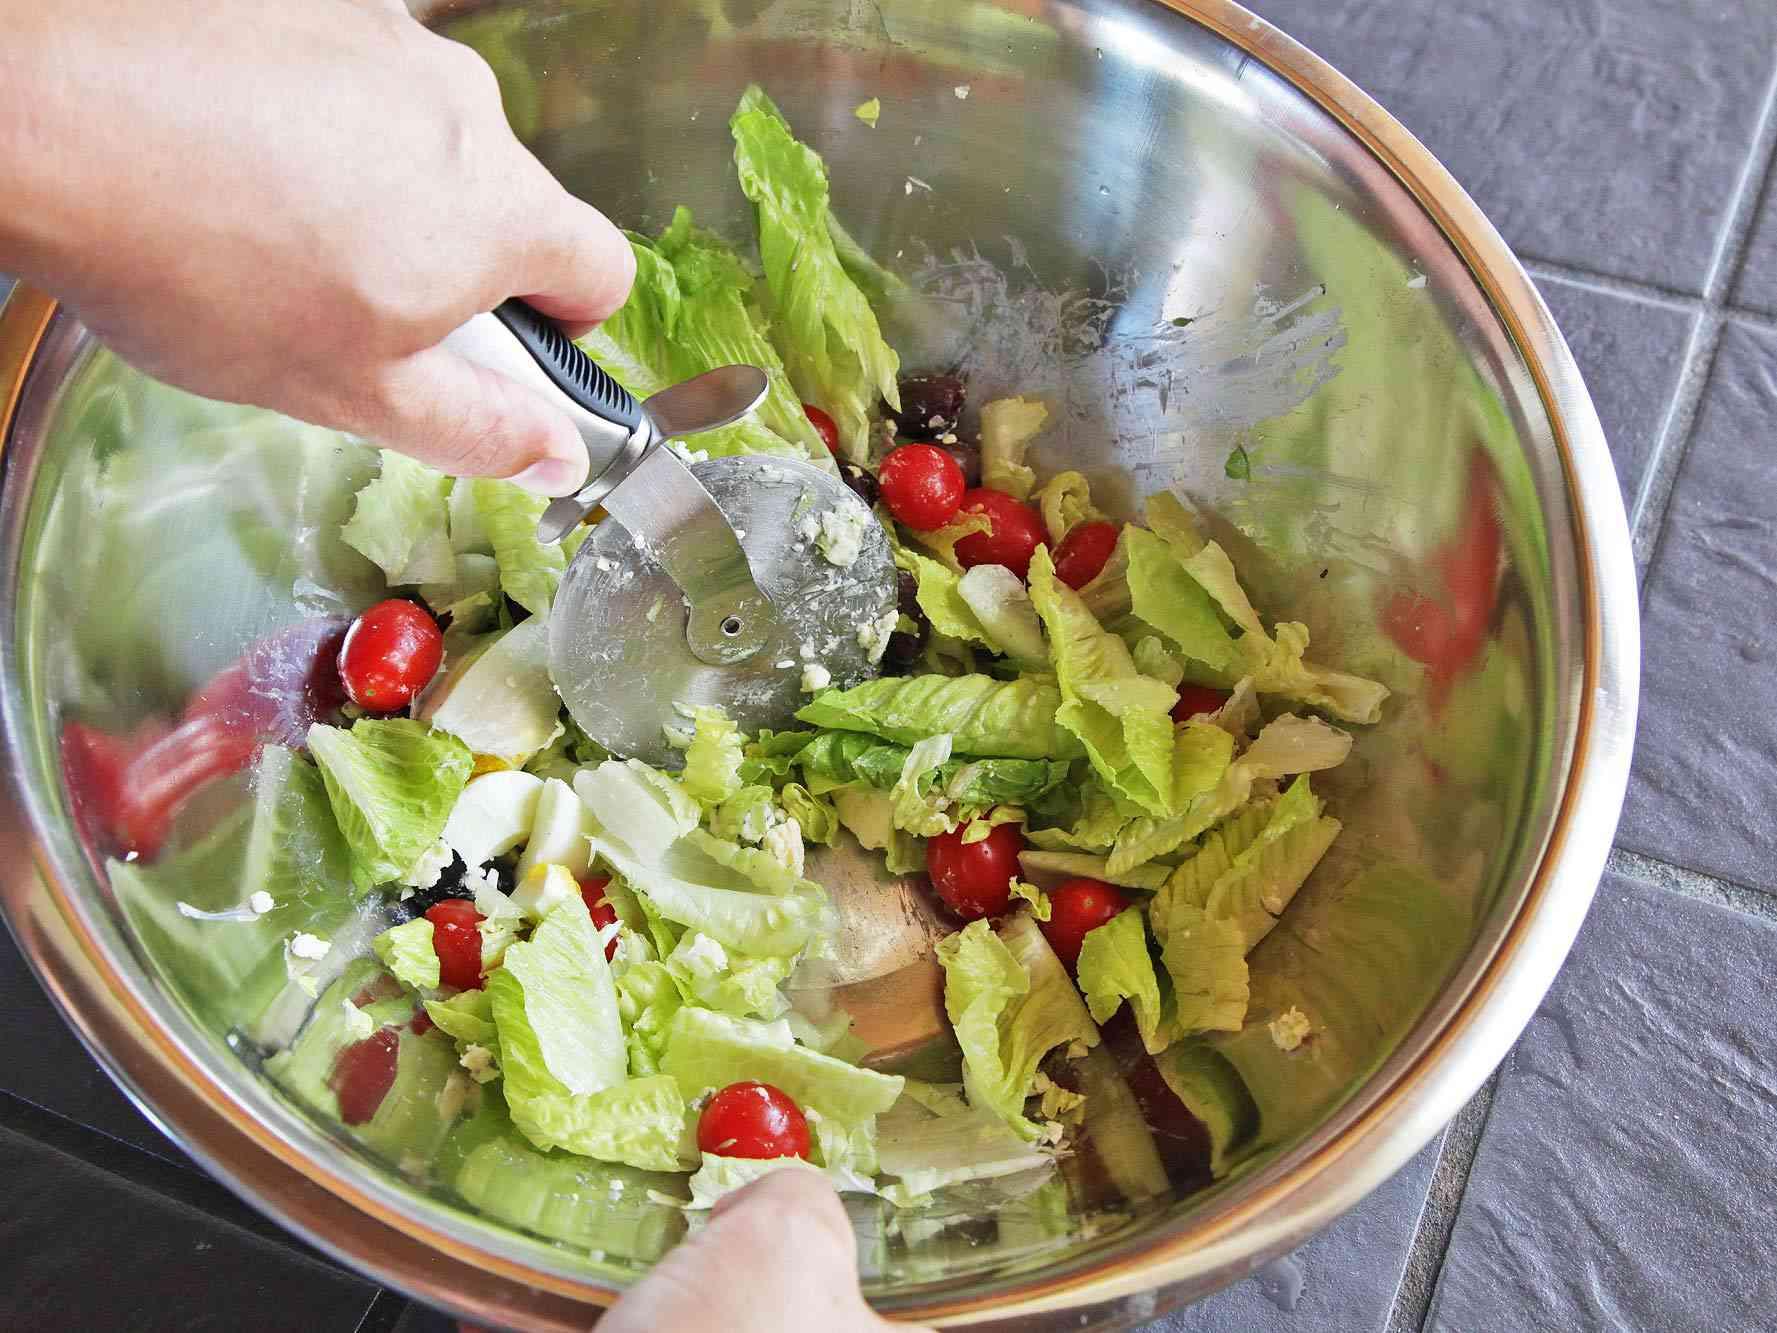 20140910-chopped-salad-pizza-wheel-4.jpg